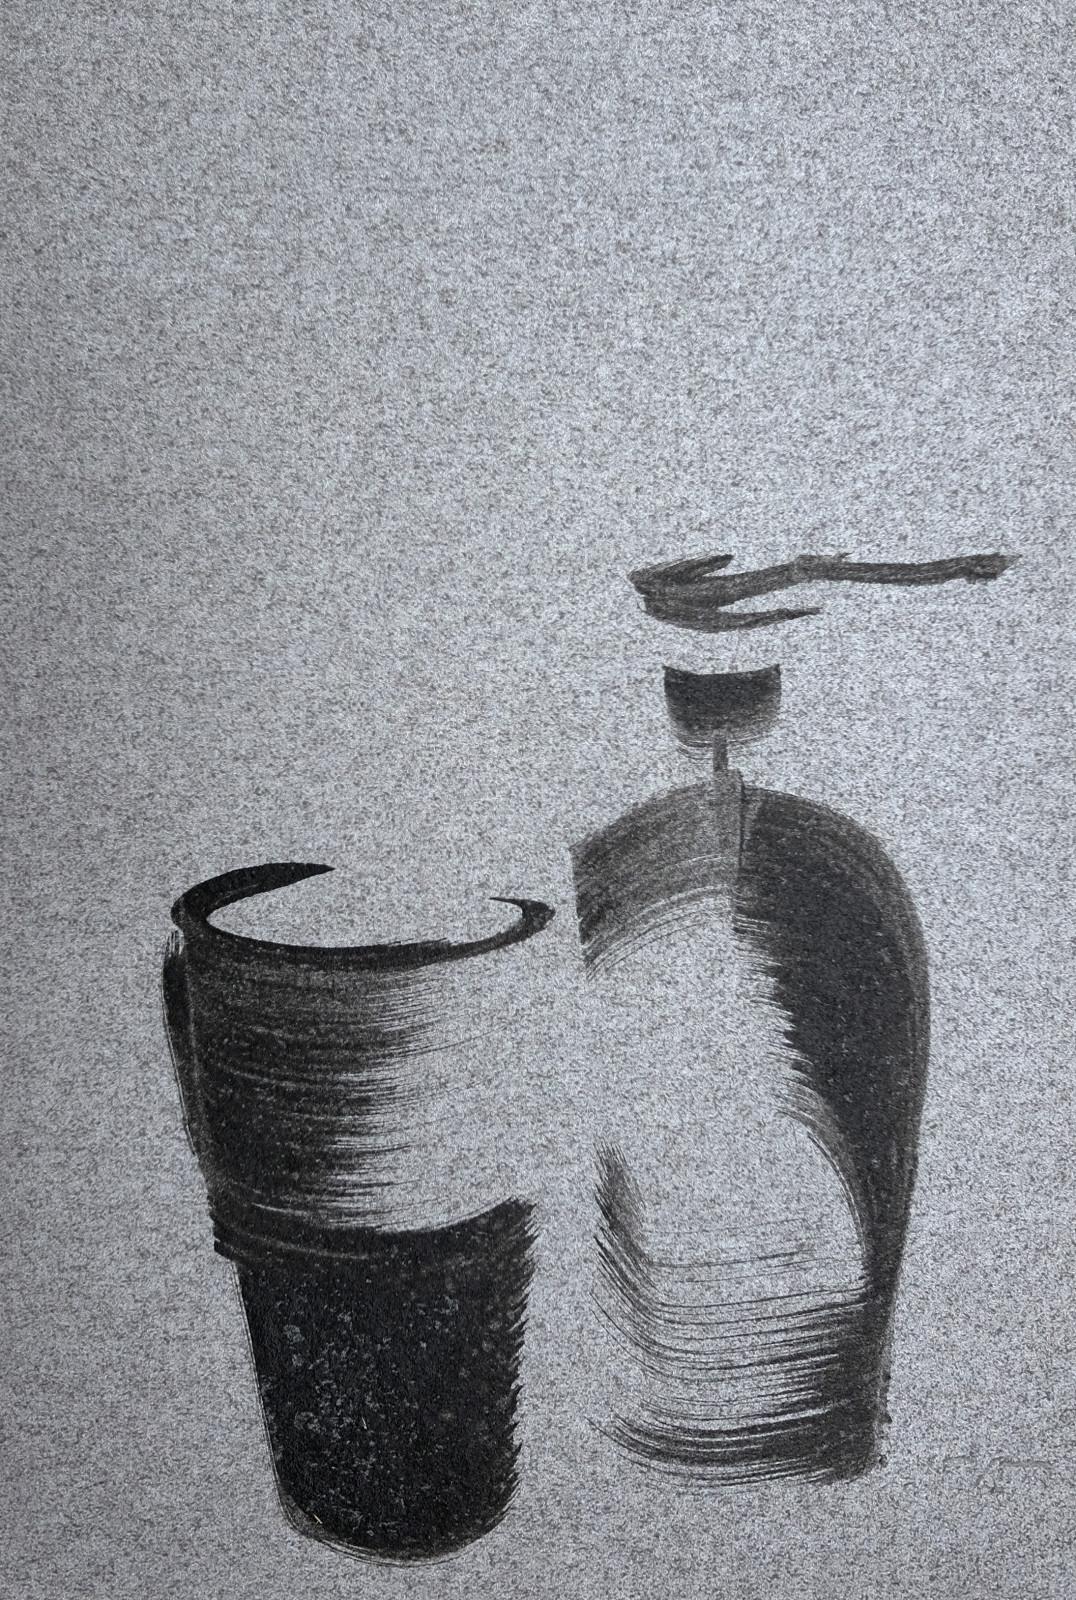 Koetzier van Hooff | Wallpaper Series | Still Life